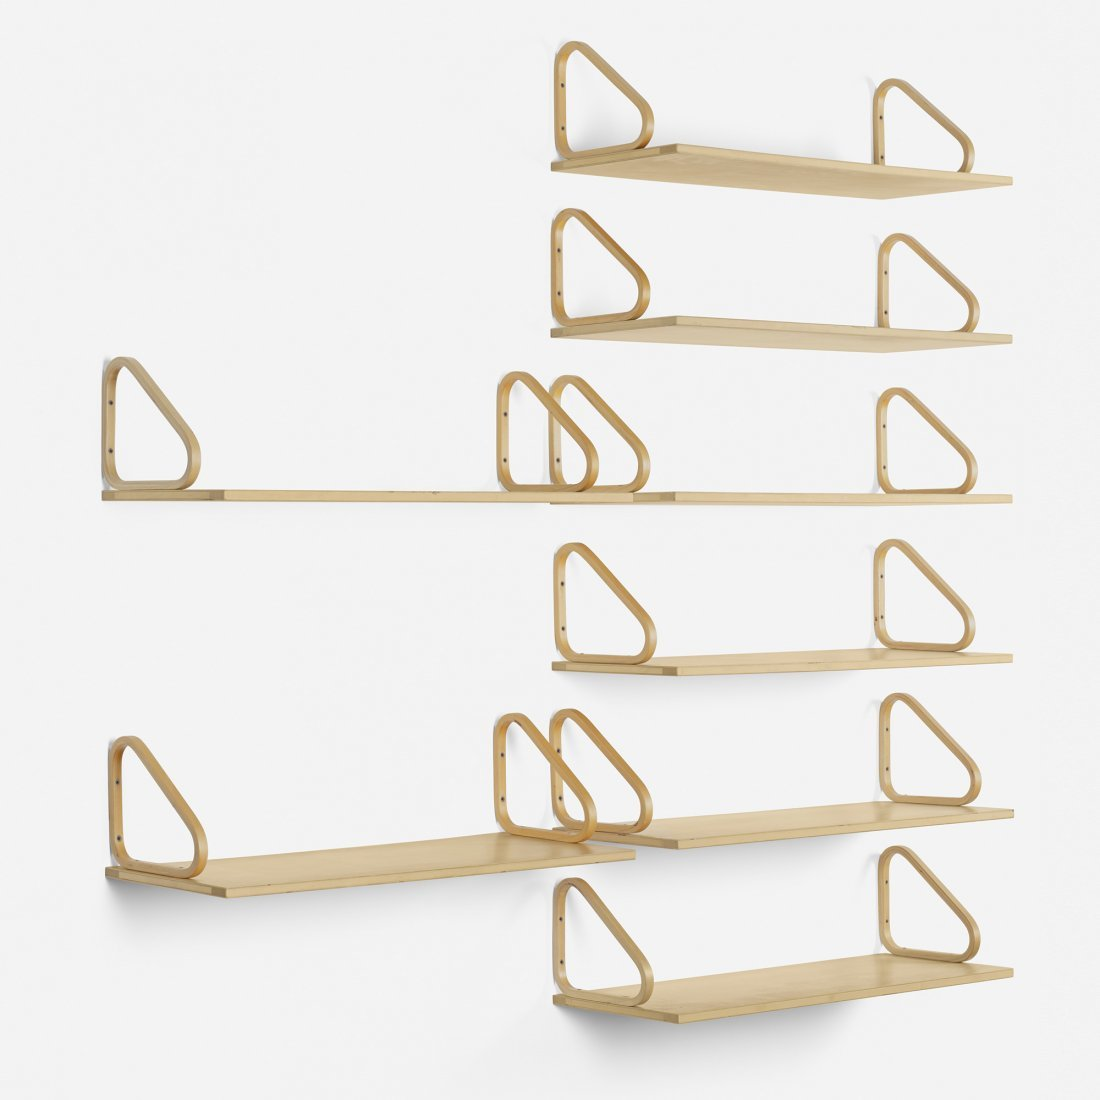 Alvar Aalto wall shelves, collection of eight